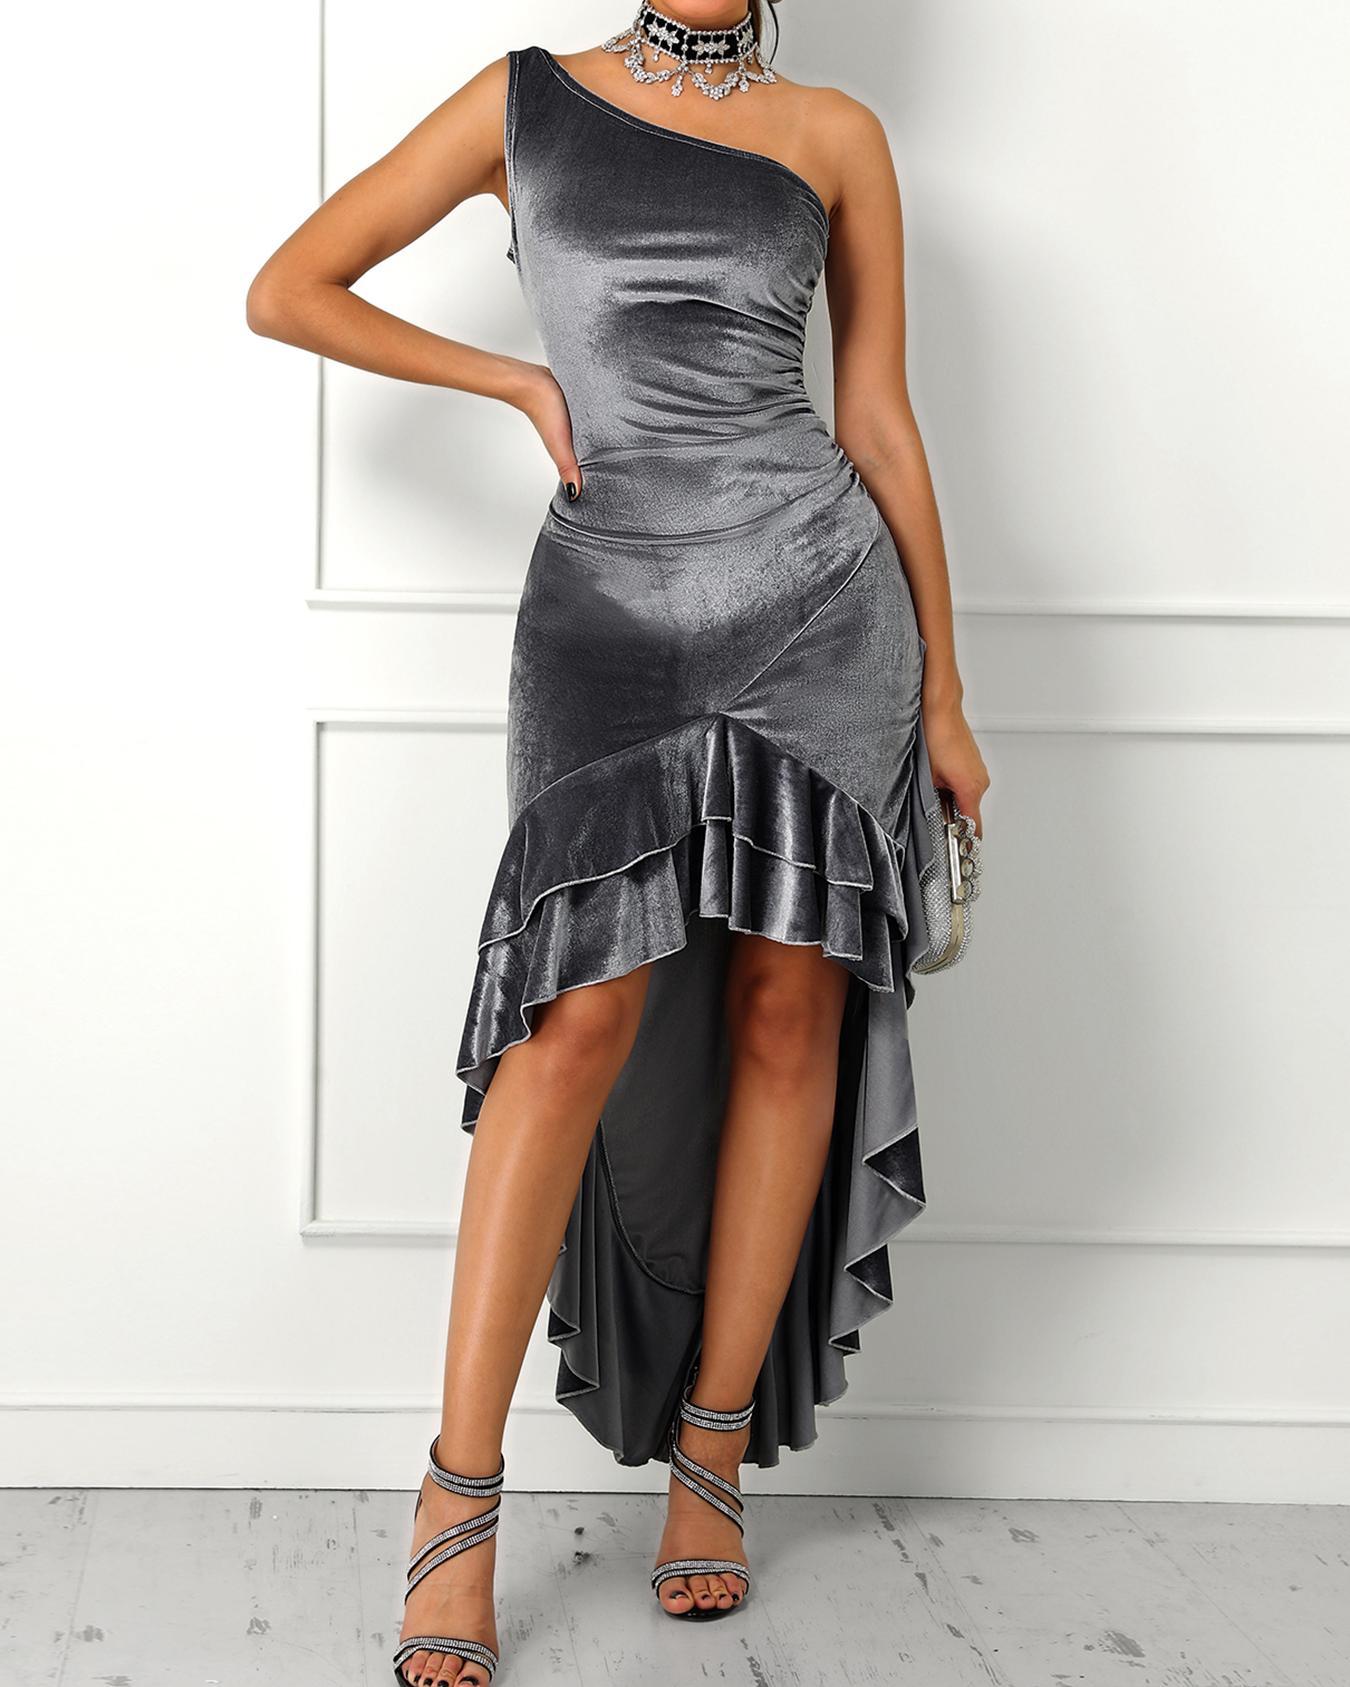 joyshoetique / Velvet One Shoulder Layered Ruffles Irregular Party Dress